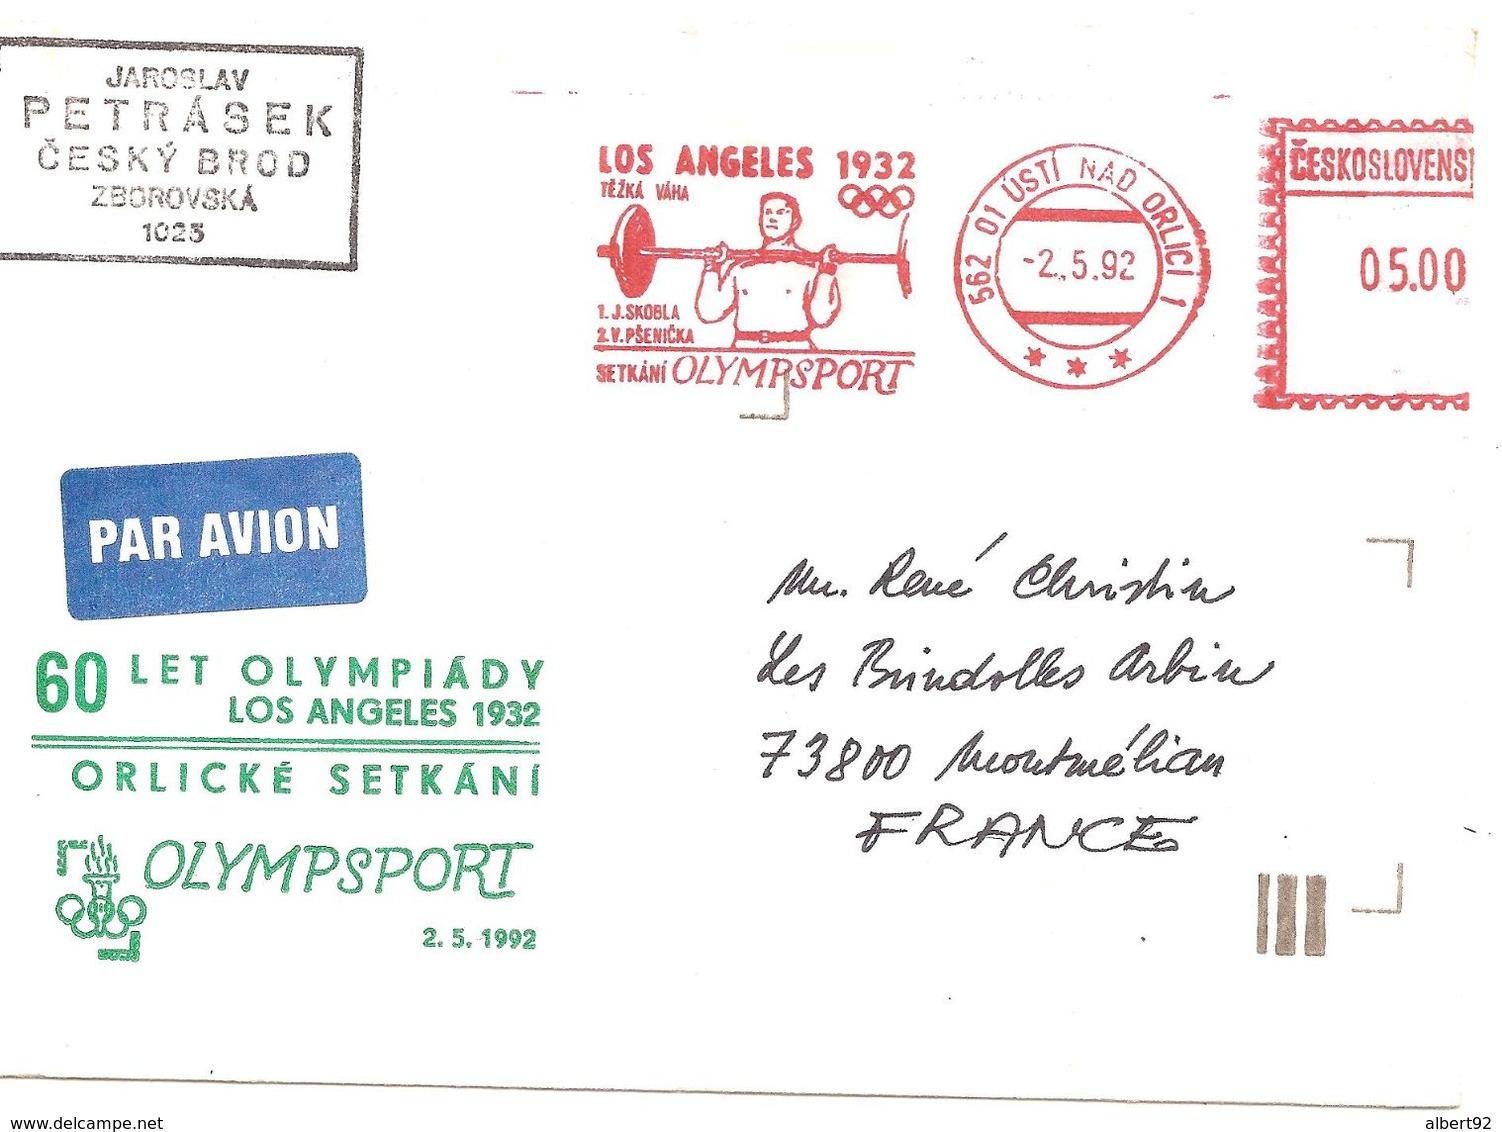 1992 EMA SKOBLA Champion Olympique D'Haltérophilie( Catégorie: Lourds) Los-Angeles 1932... - Gewichtheben